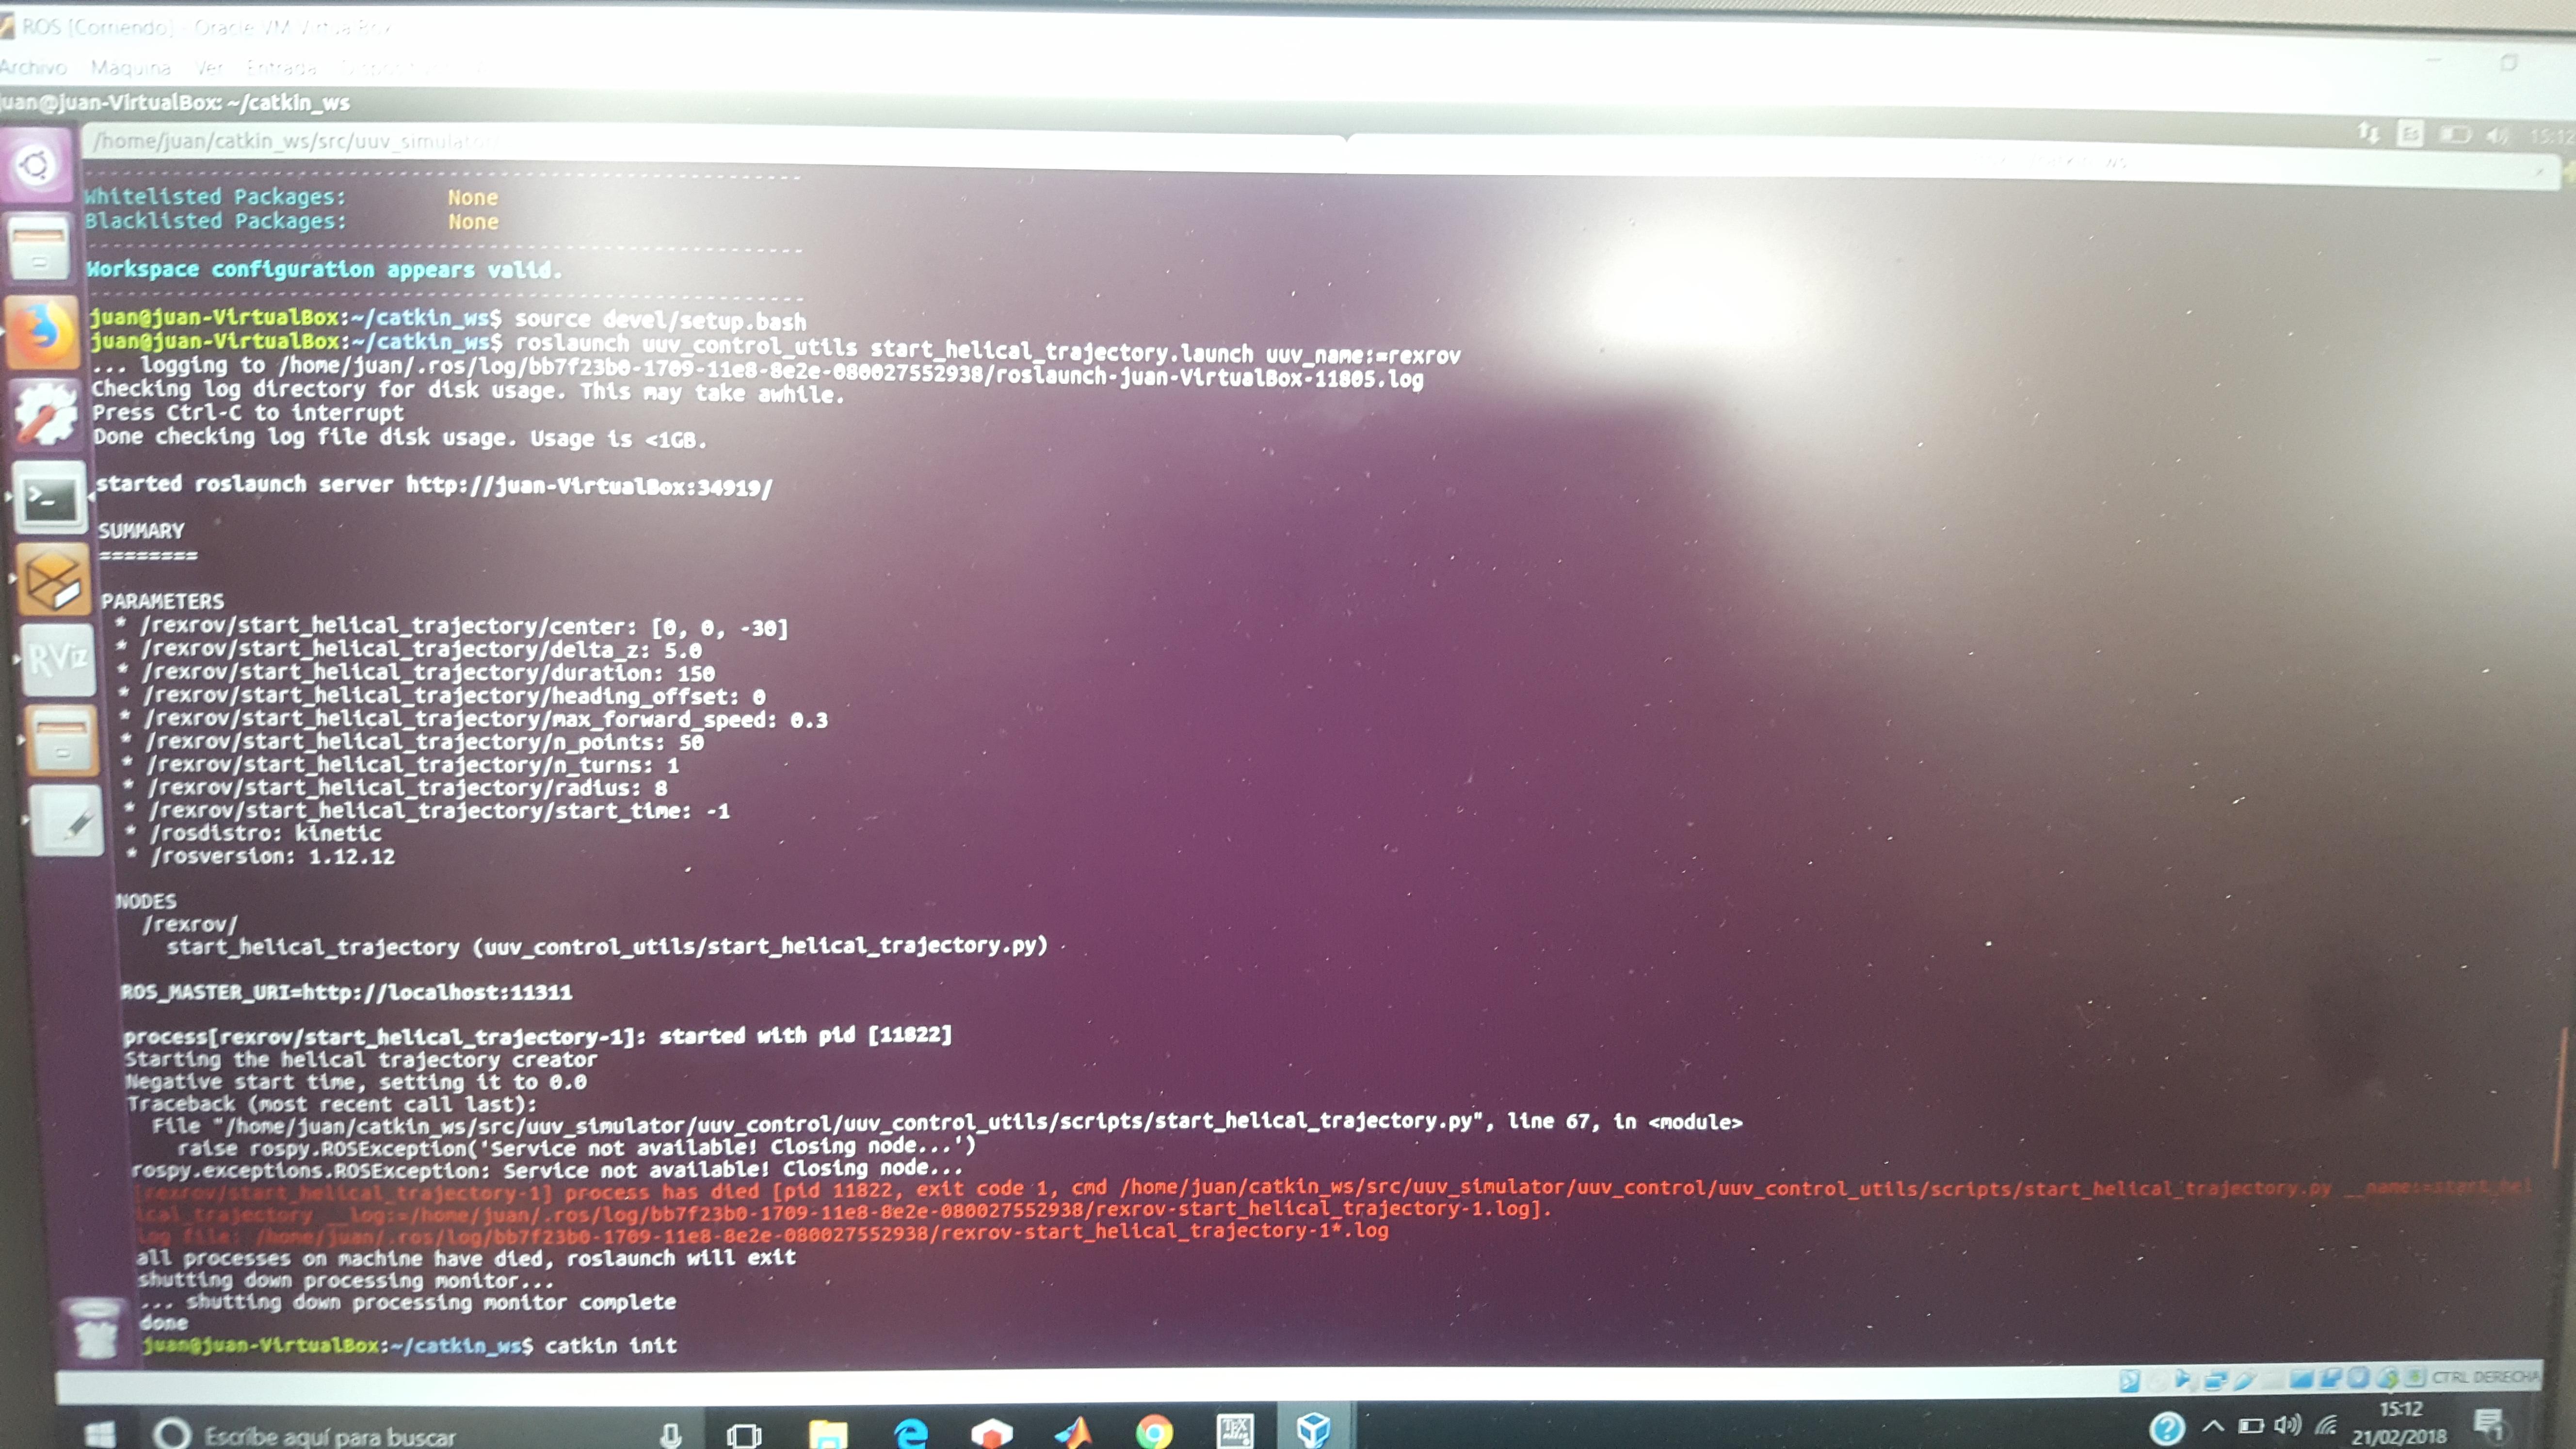 Problem running files described in